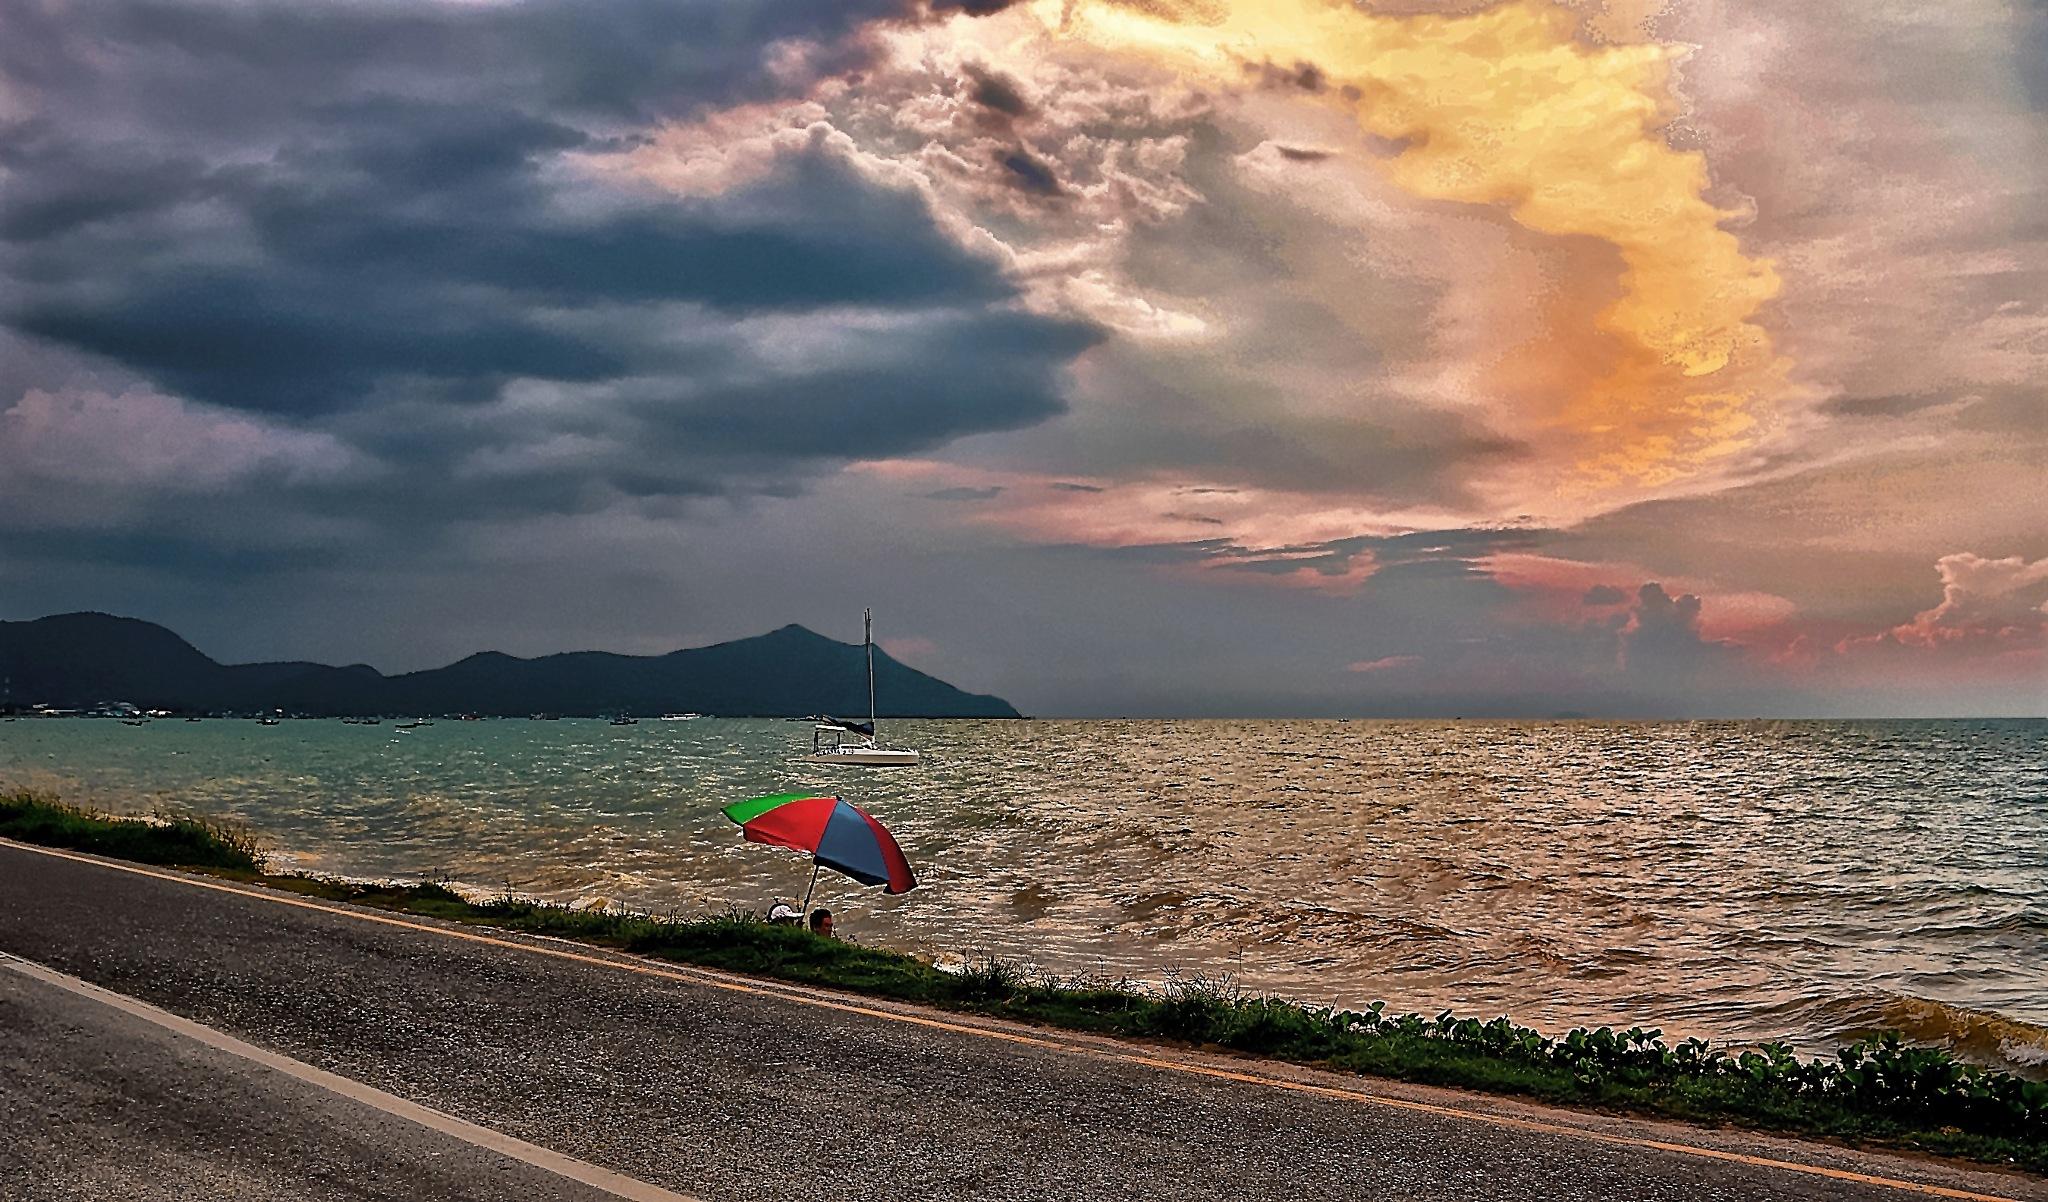 Sunset Photographers by WilliamReid